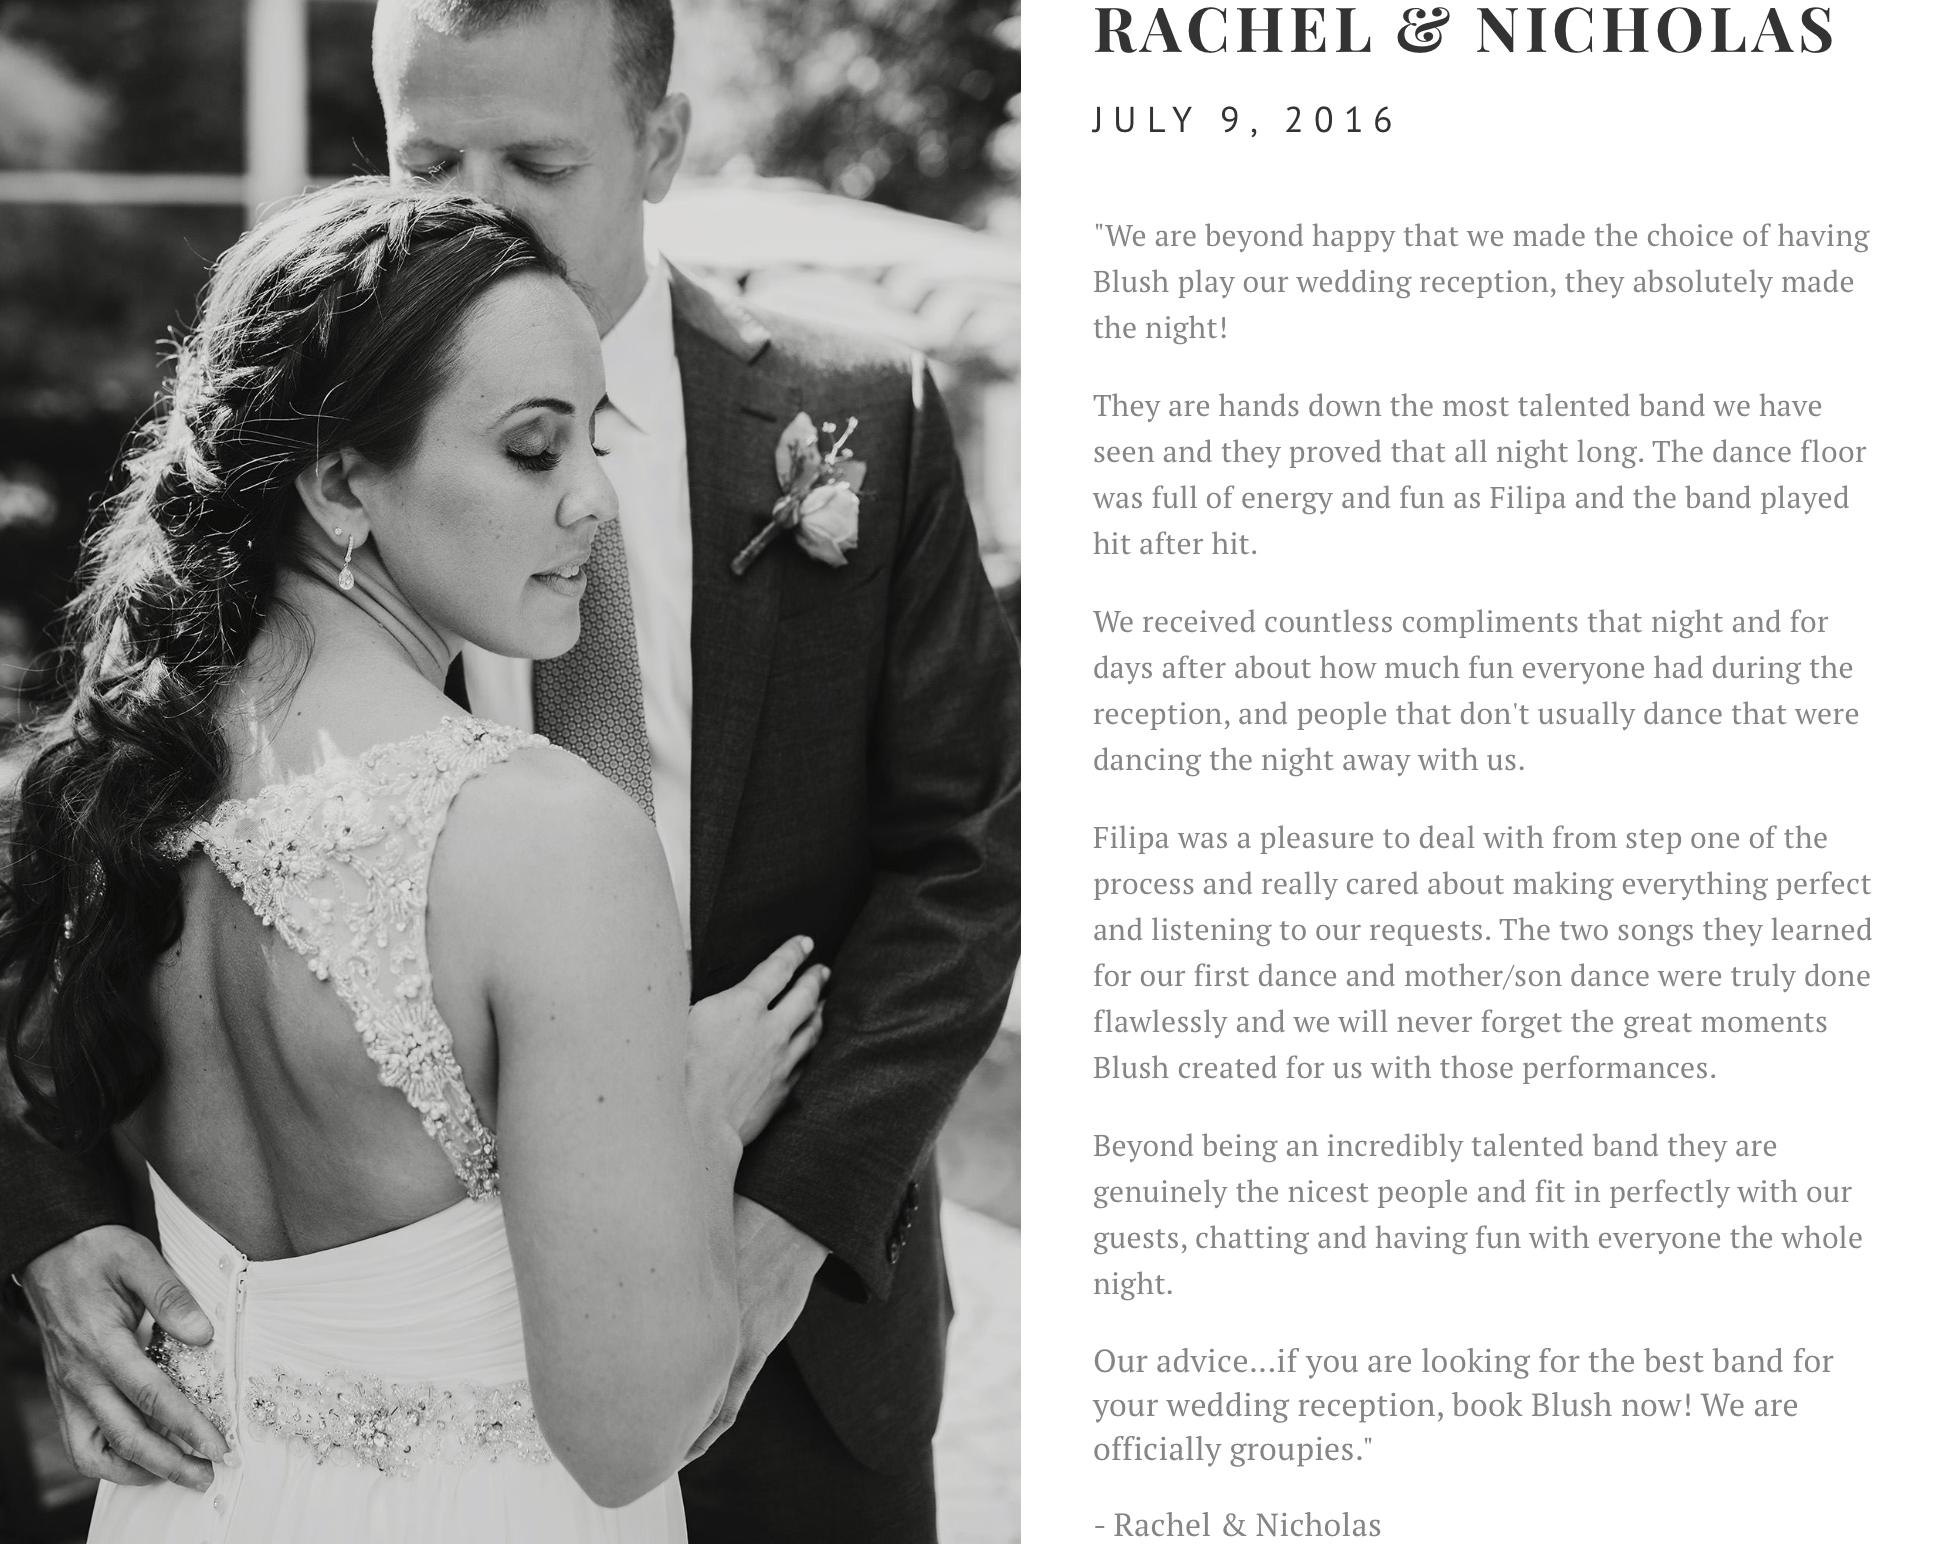 blush band toronto wedding review nicholas rachel demonte buffalo usa top 40 cover dance rock premium live entertainment